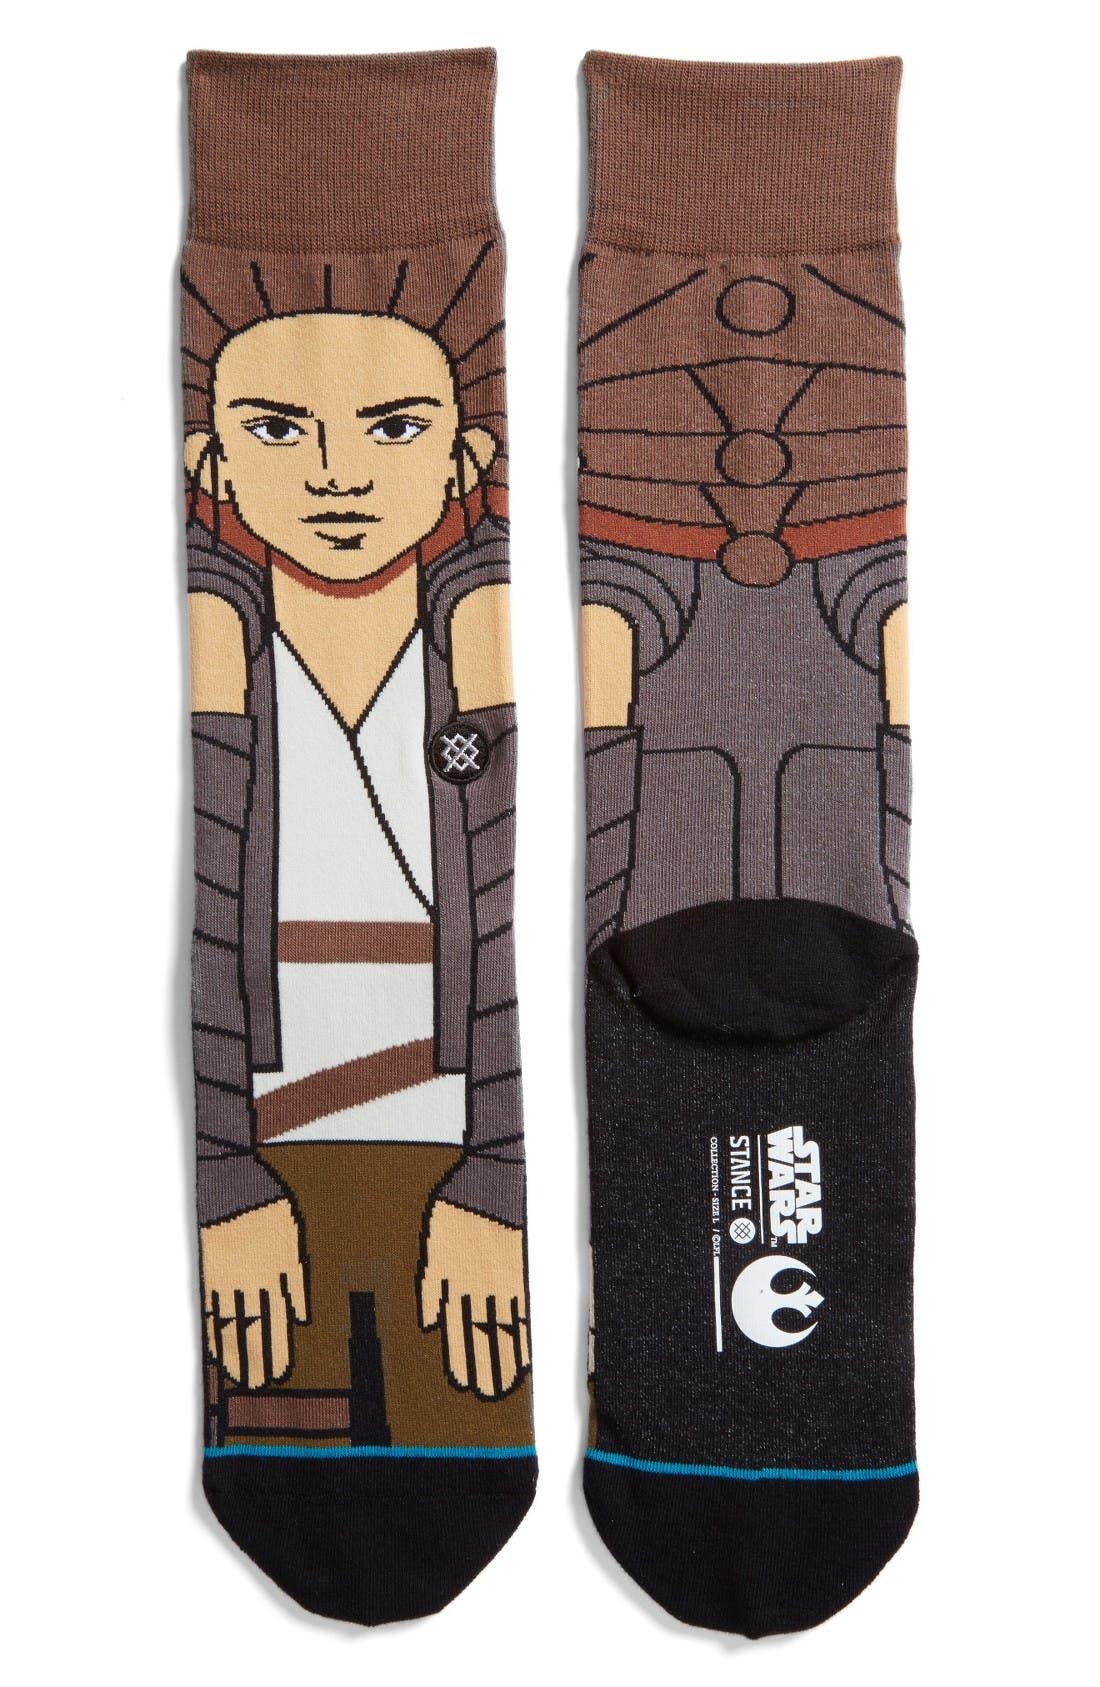 Main Image - Stance Star Wars Awakened Socks